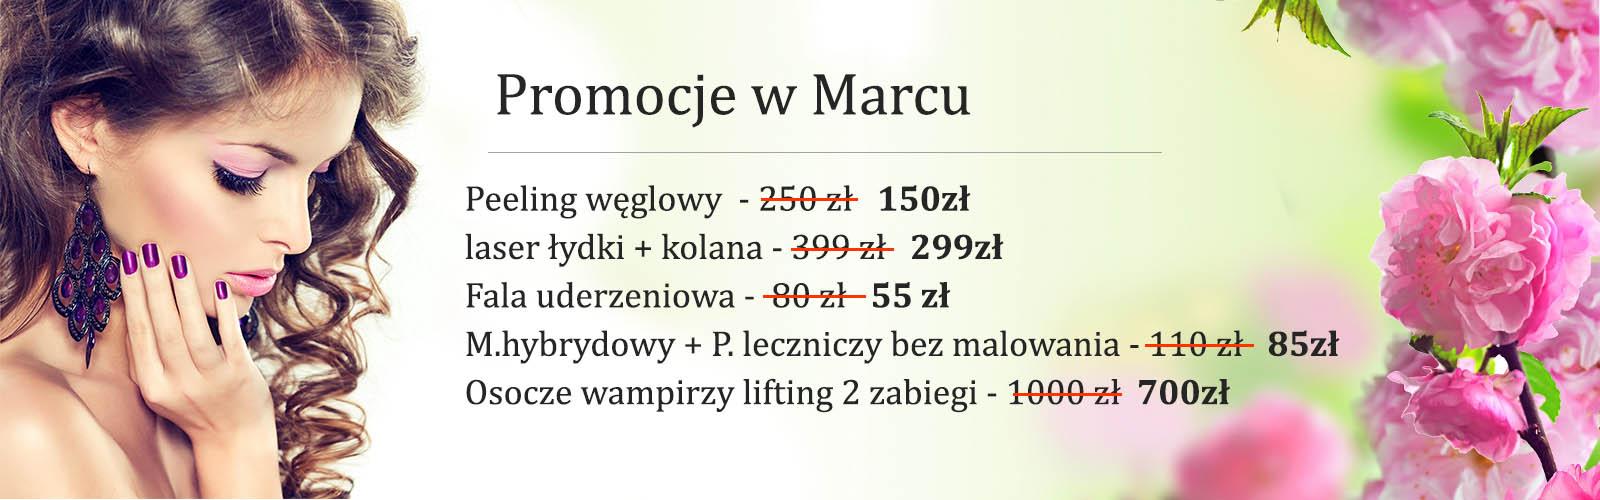 promocja-marzec-2019